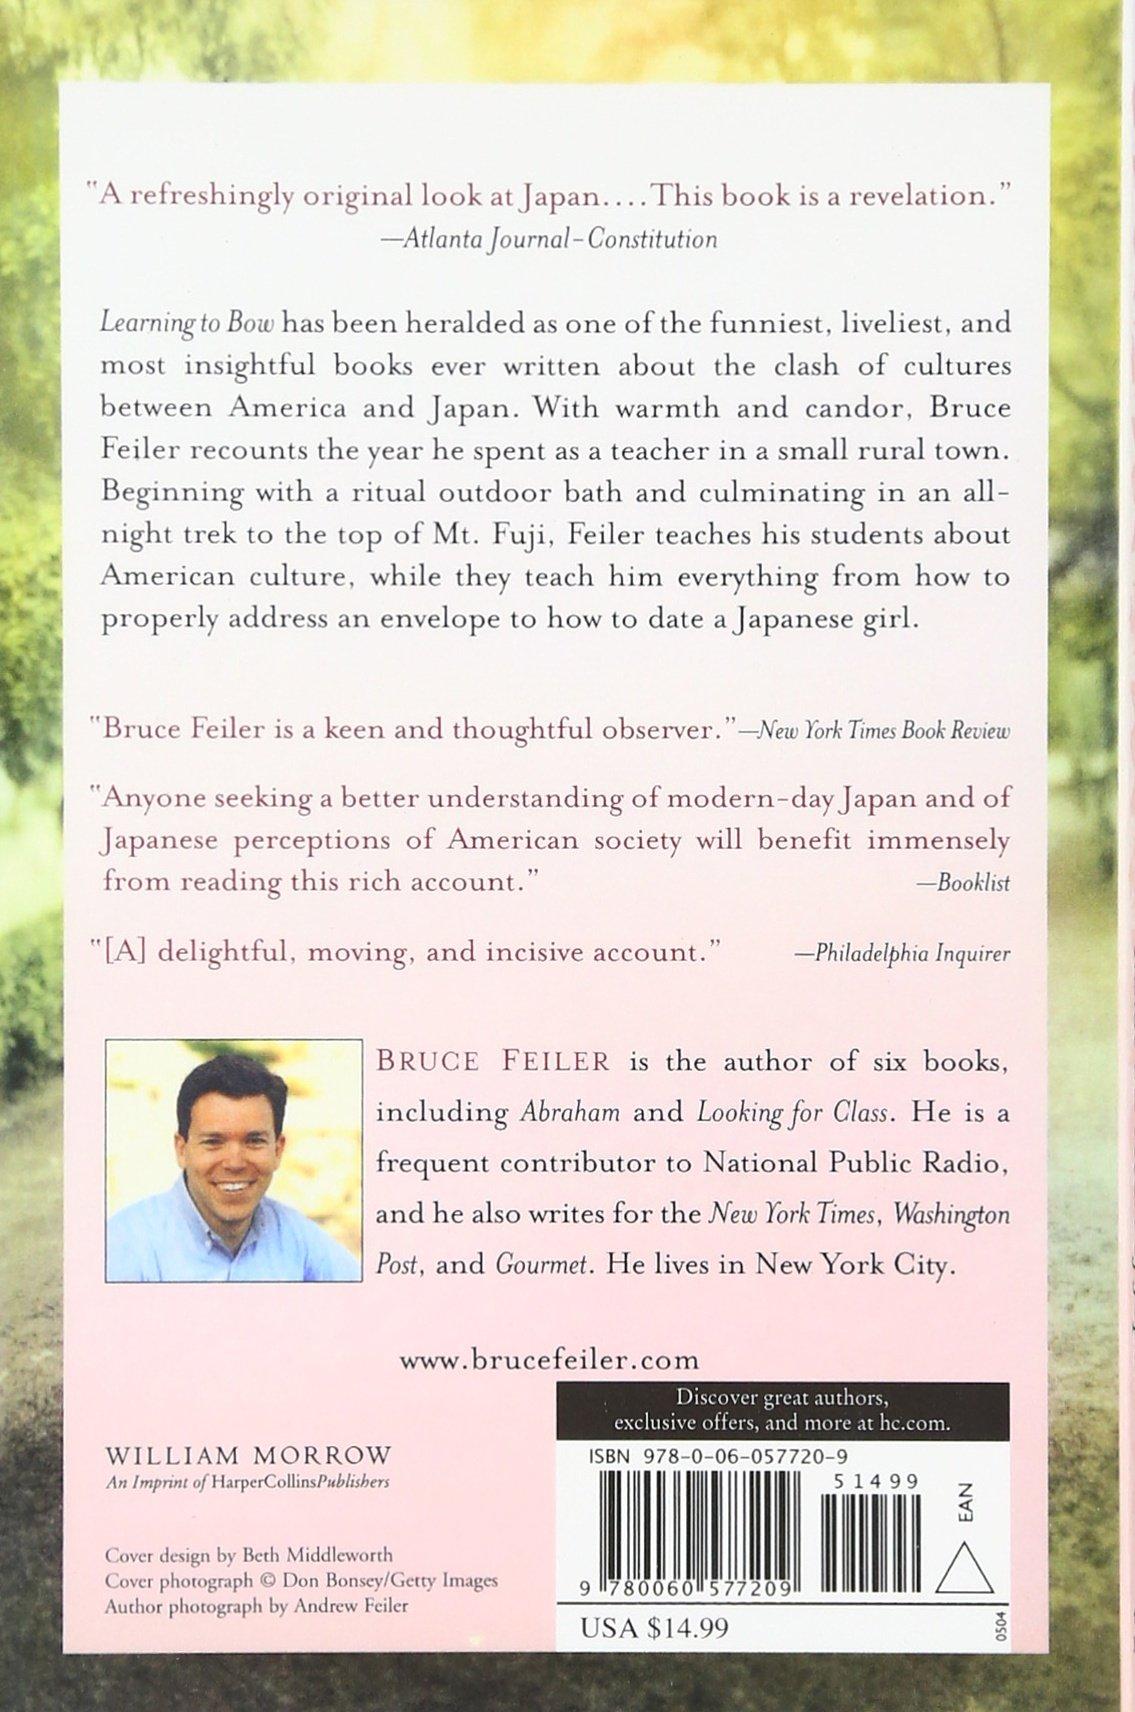 Learning to Bow: Inside the Heart of Japan: Bruce Feiler: 9780060577209: Amazon.com: Books